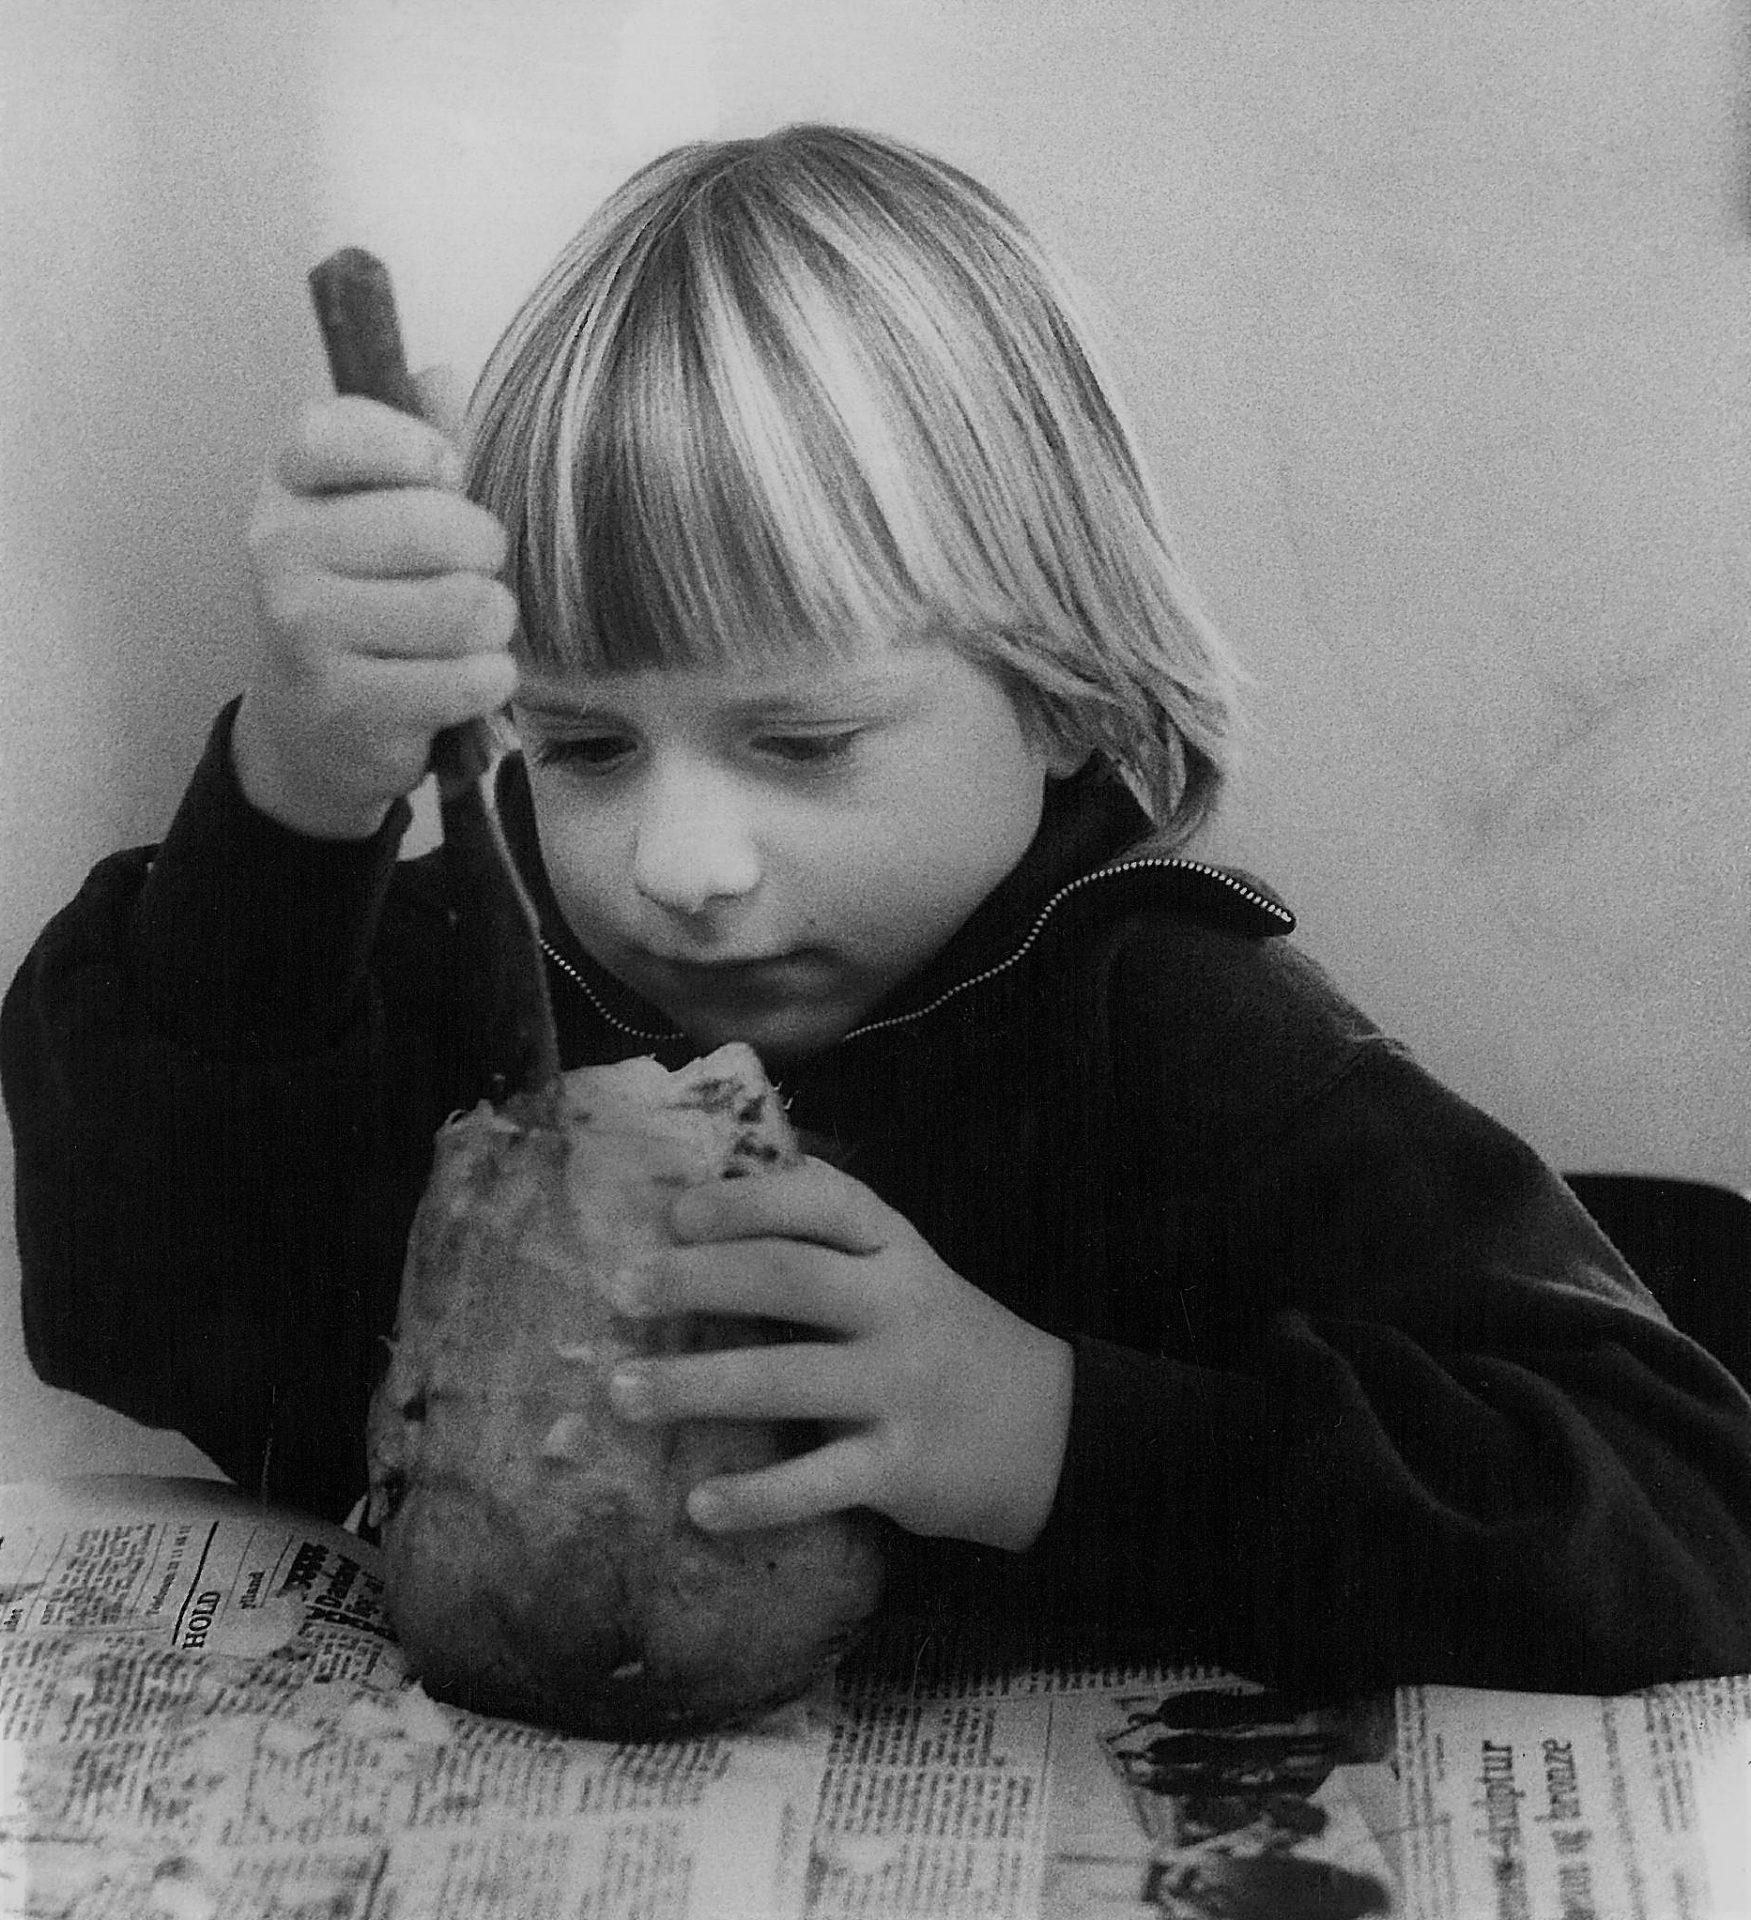 Et barn skærer en roelygte